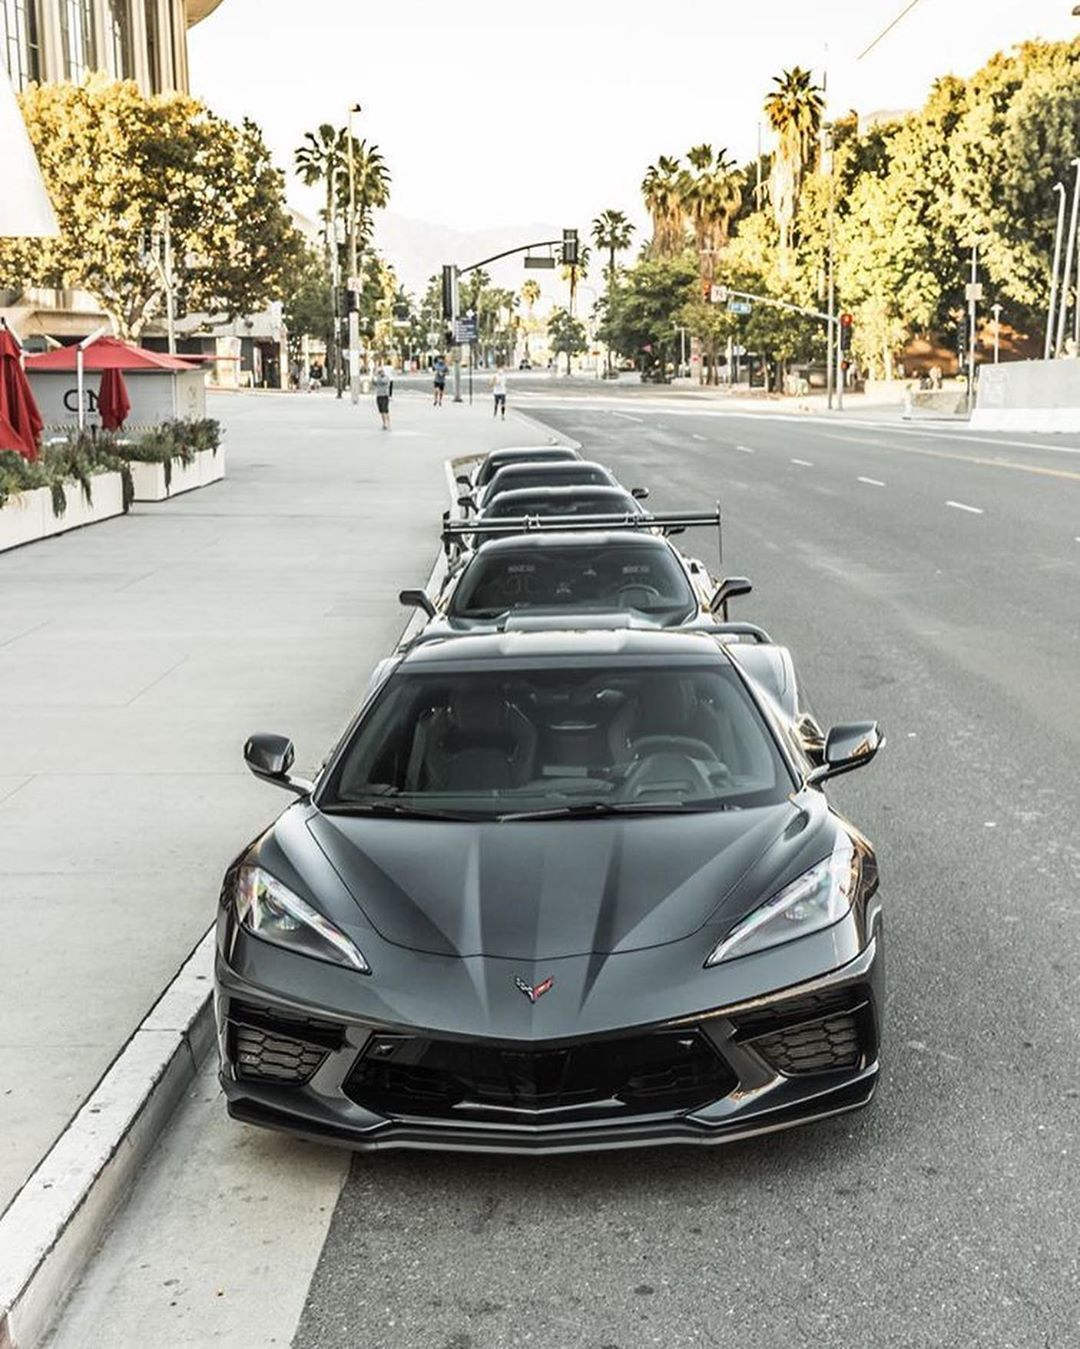 Corvette Society On Instagram Super Clean C8 Owned By Boosted C8 Photo Photographer Dan In 2020 Chevrolet Corvette Corvette Bmw Car